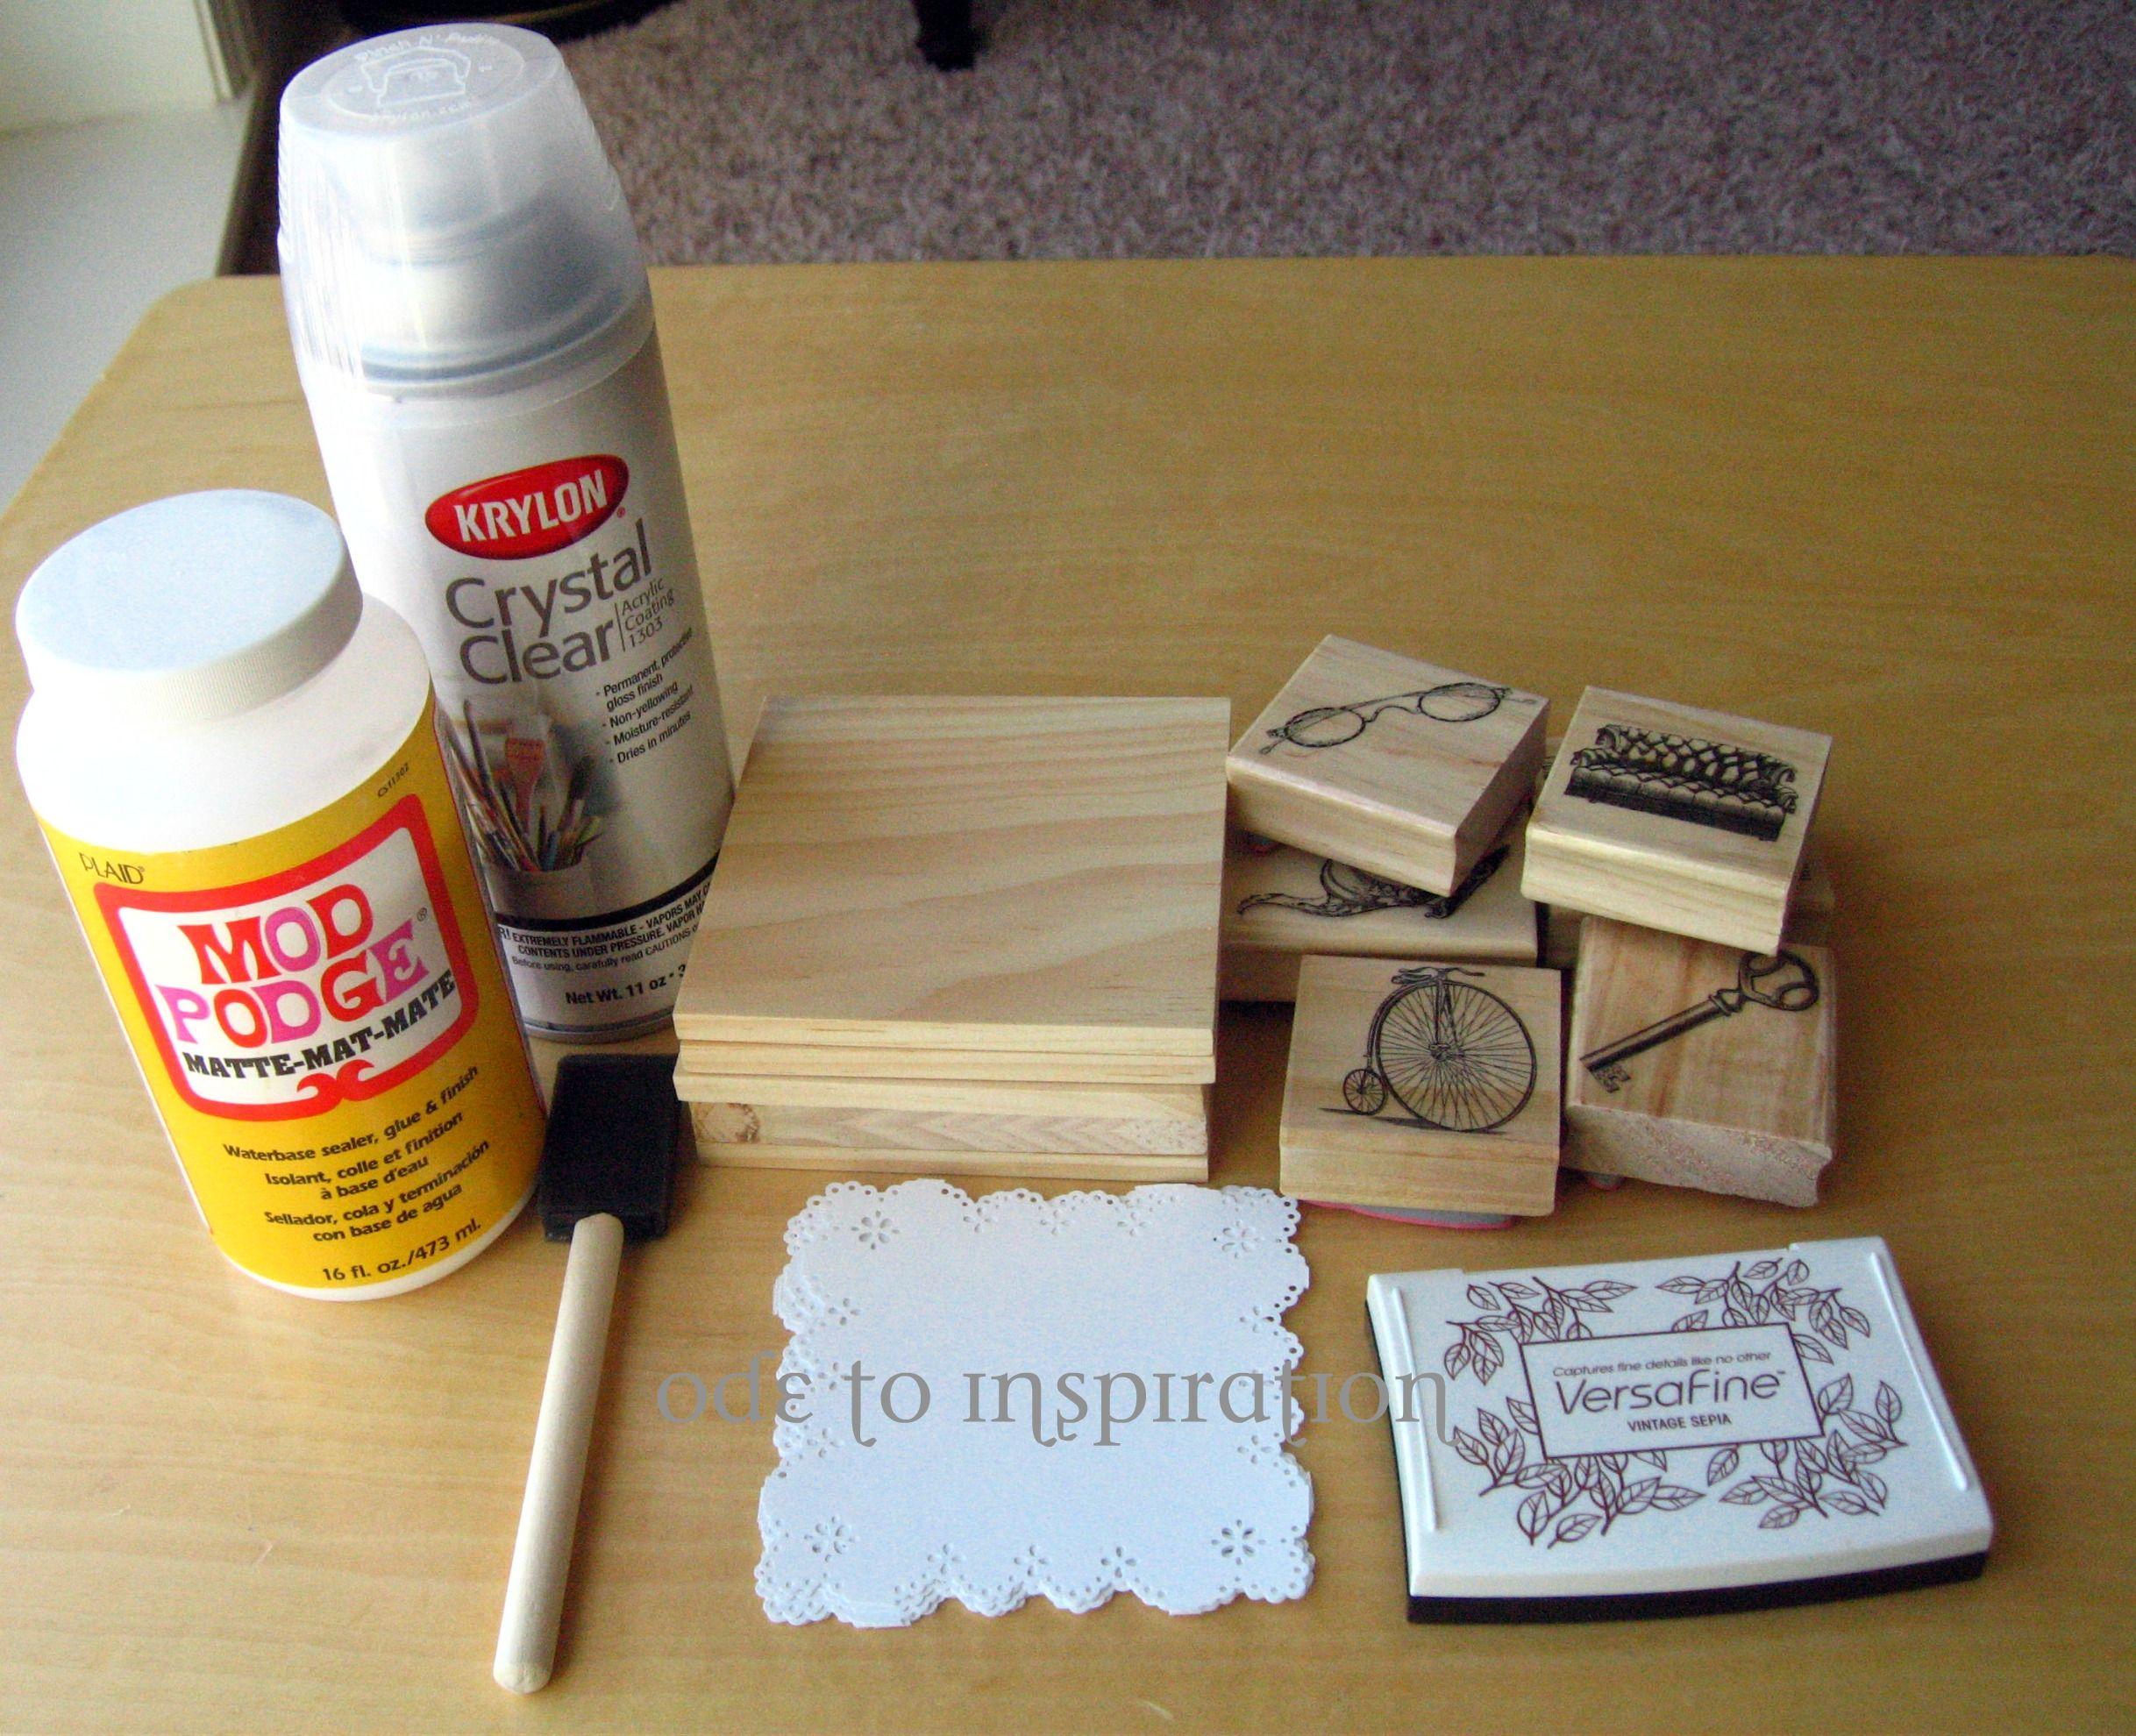 Photo modge podge on wood easy craft ideas for Modge podge ideas